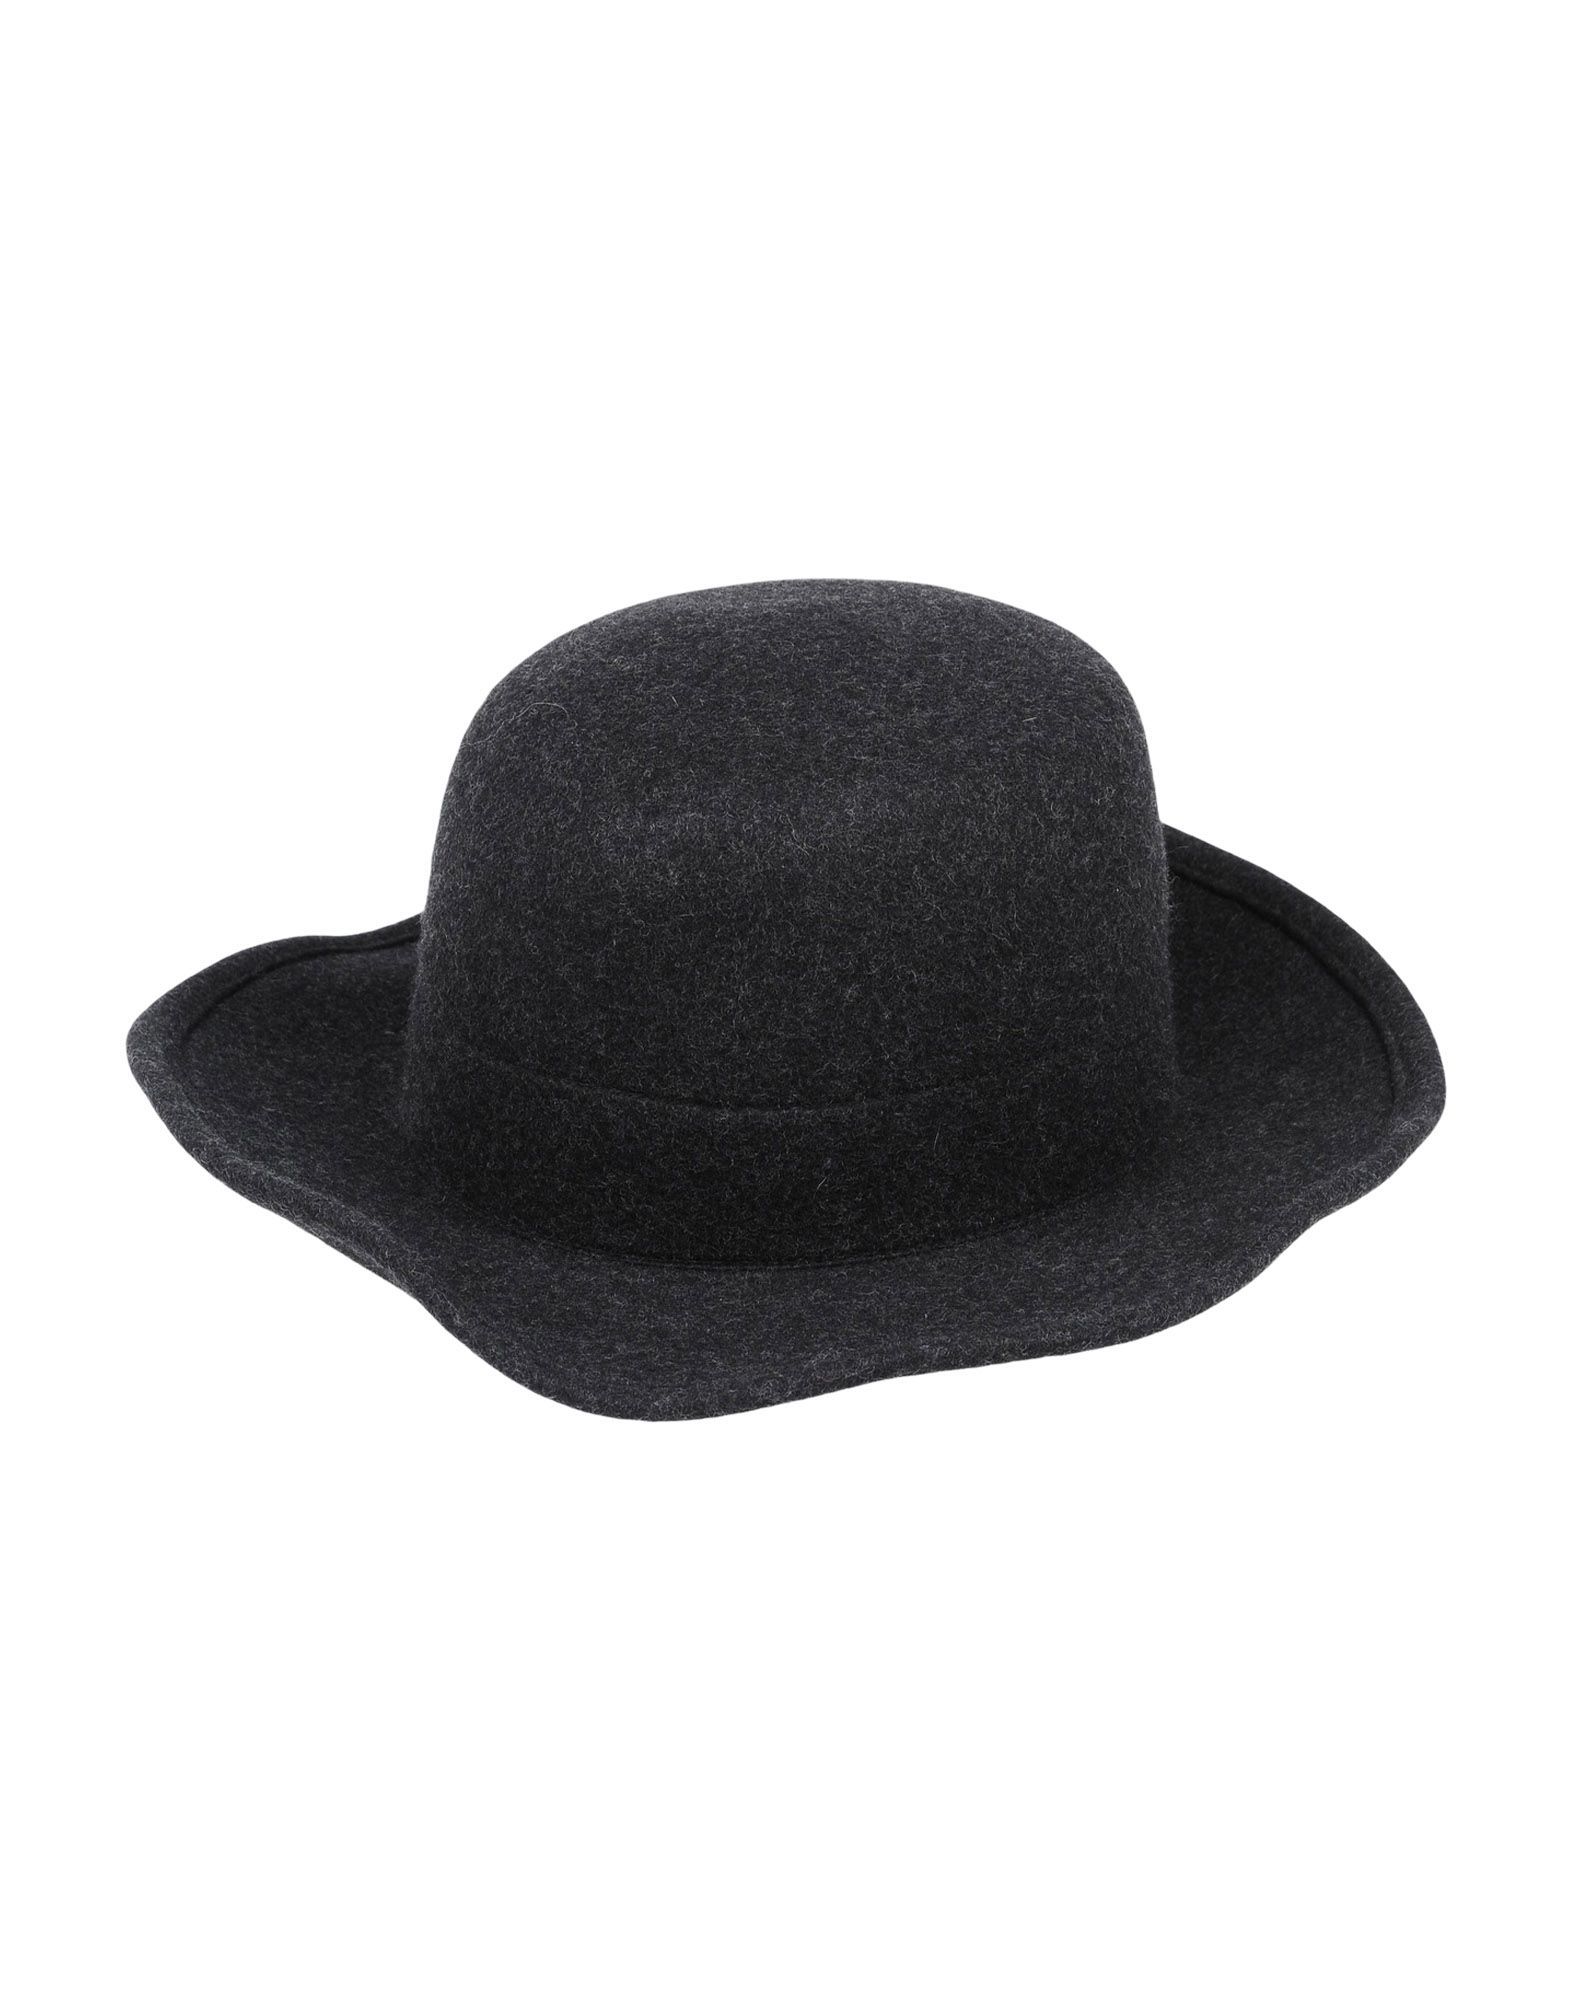 SCHA Hat in Lead